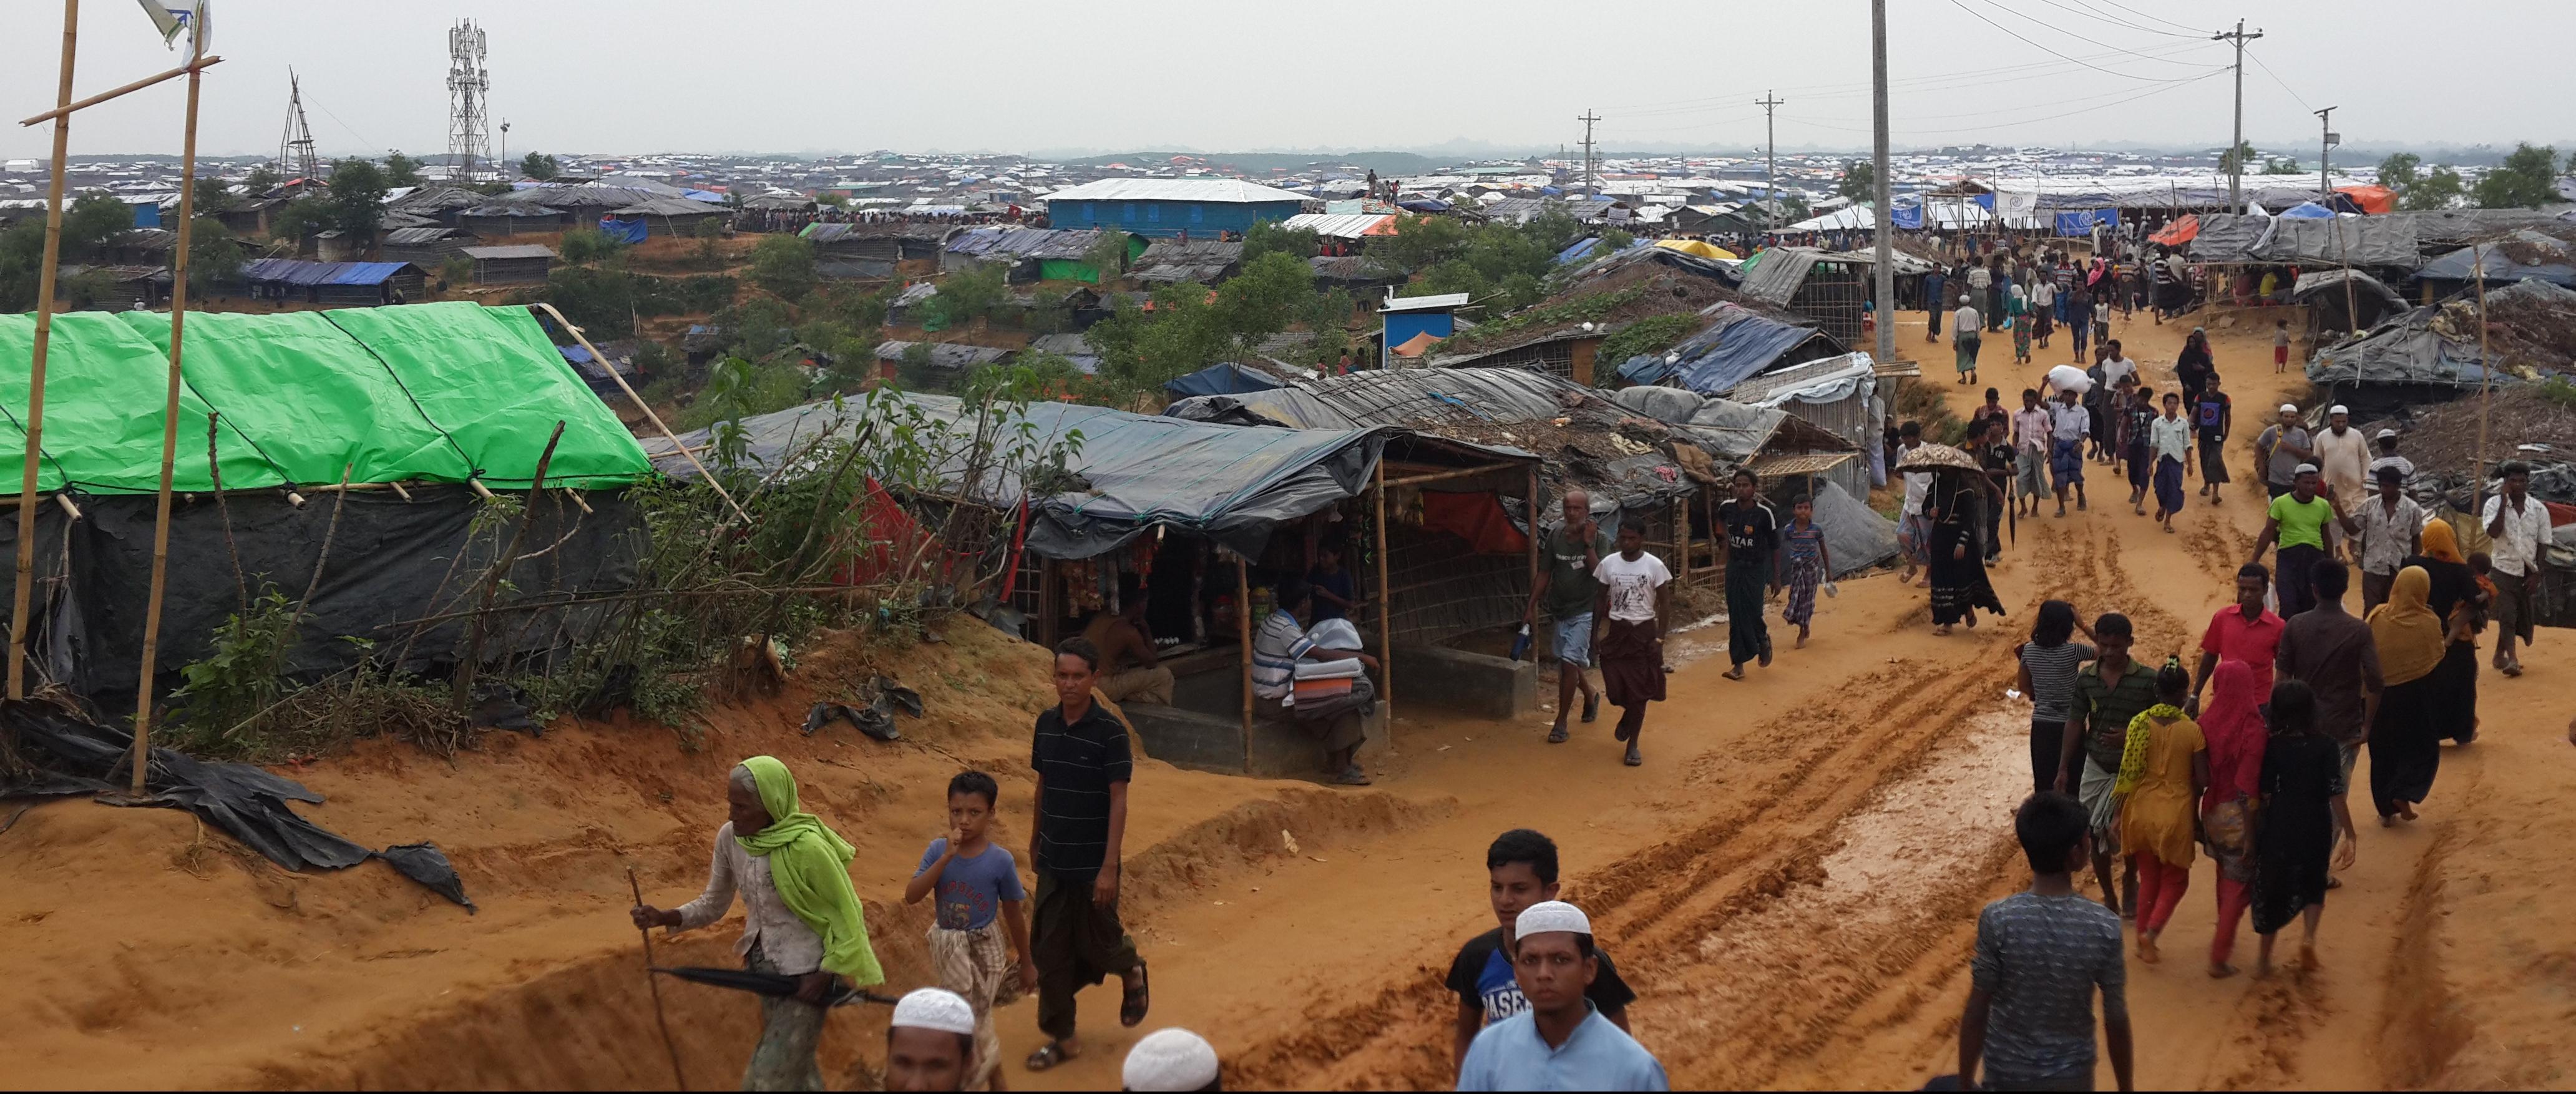 kutupolong-new-camp.jpg